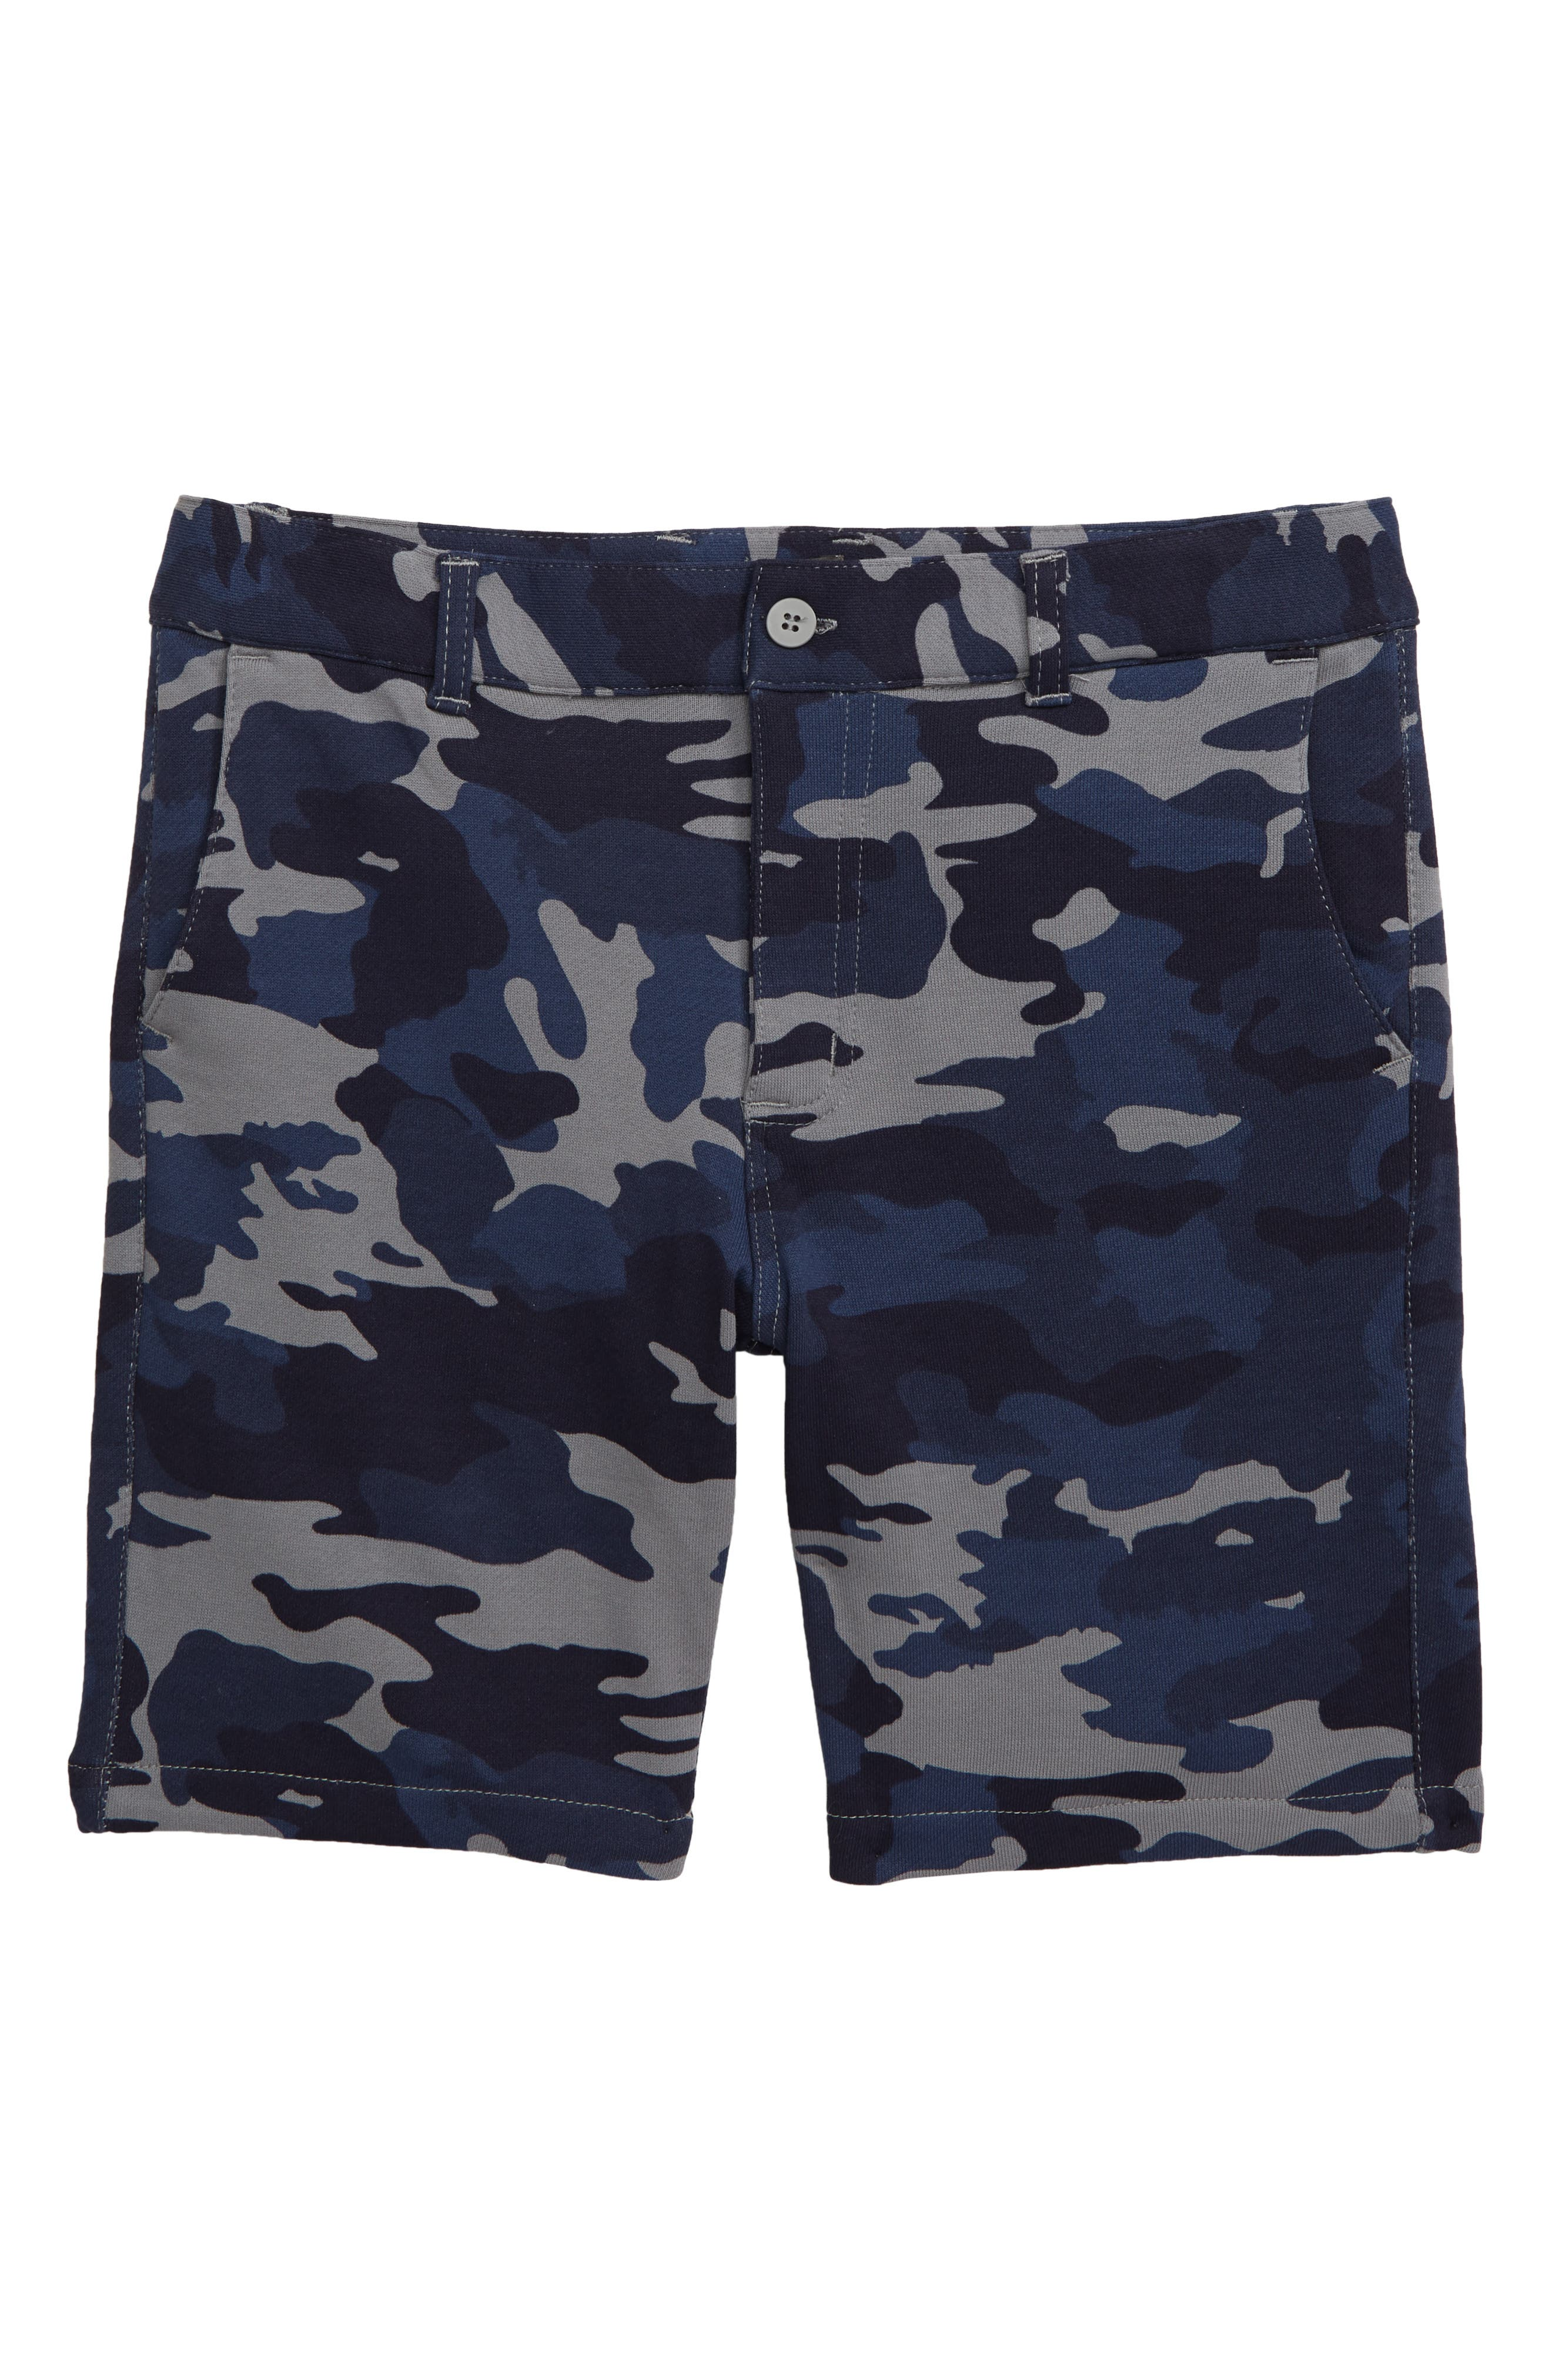 SLATE & STONE, Print Shorts, Main thumbnail 1, color, BLUE CAMO